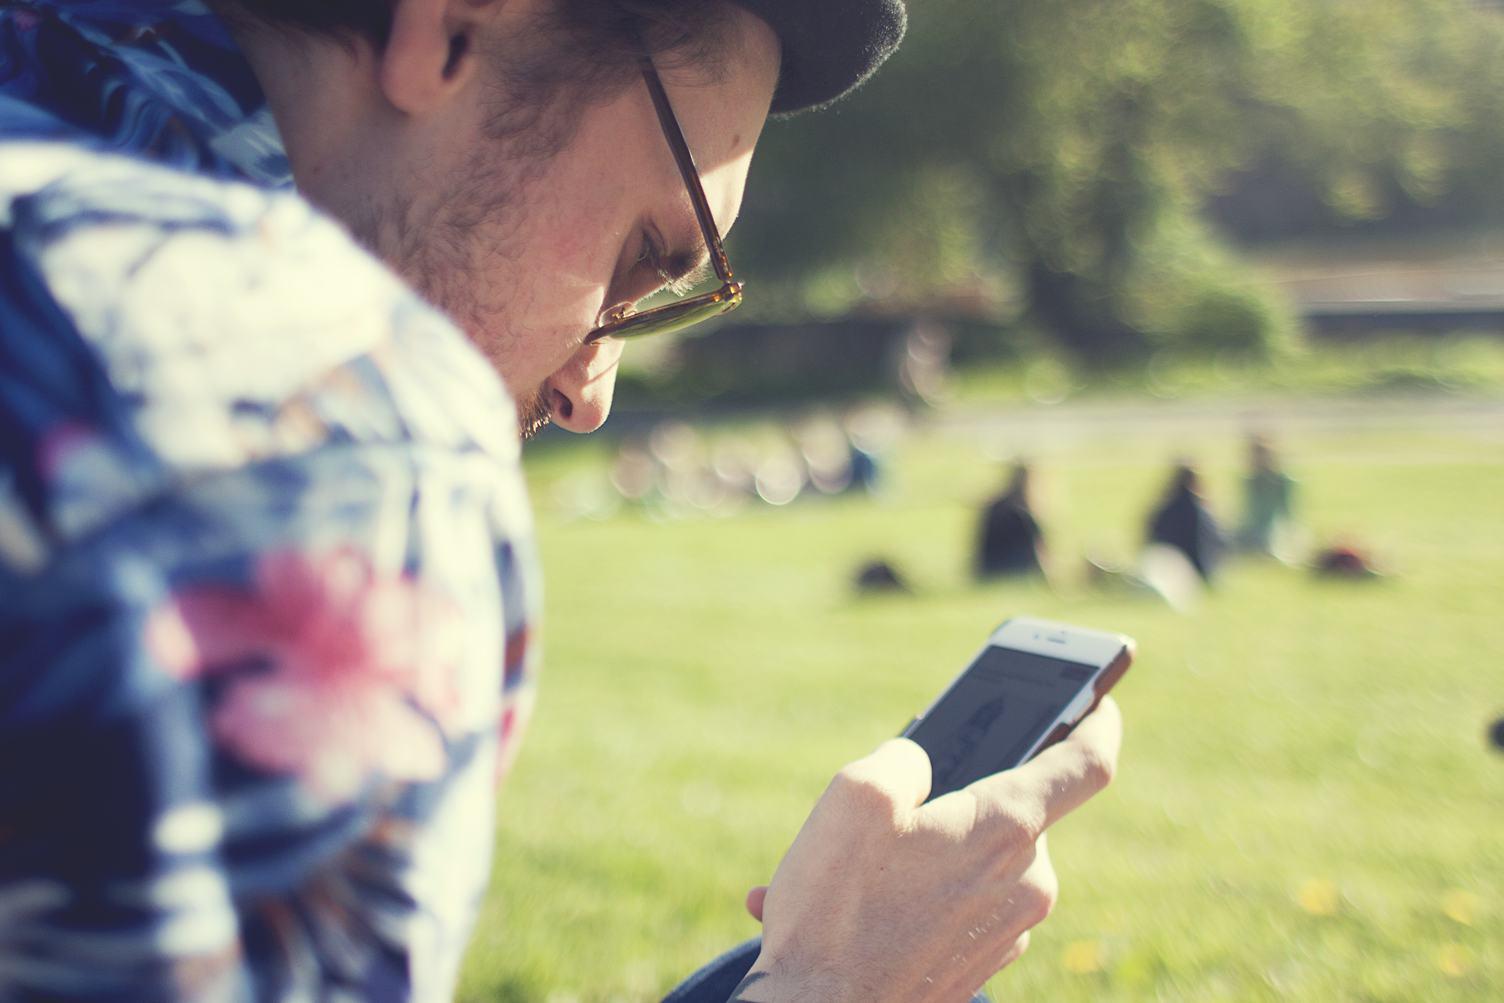 Man  Holding Smartphone on Blurred Background